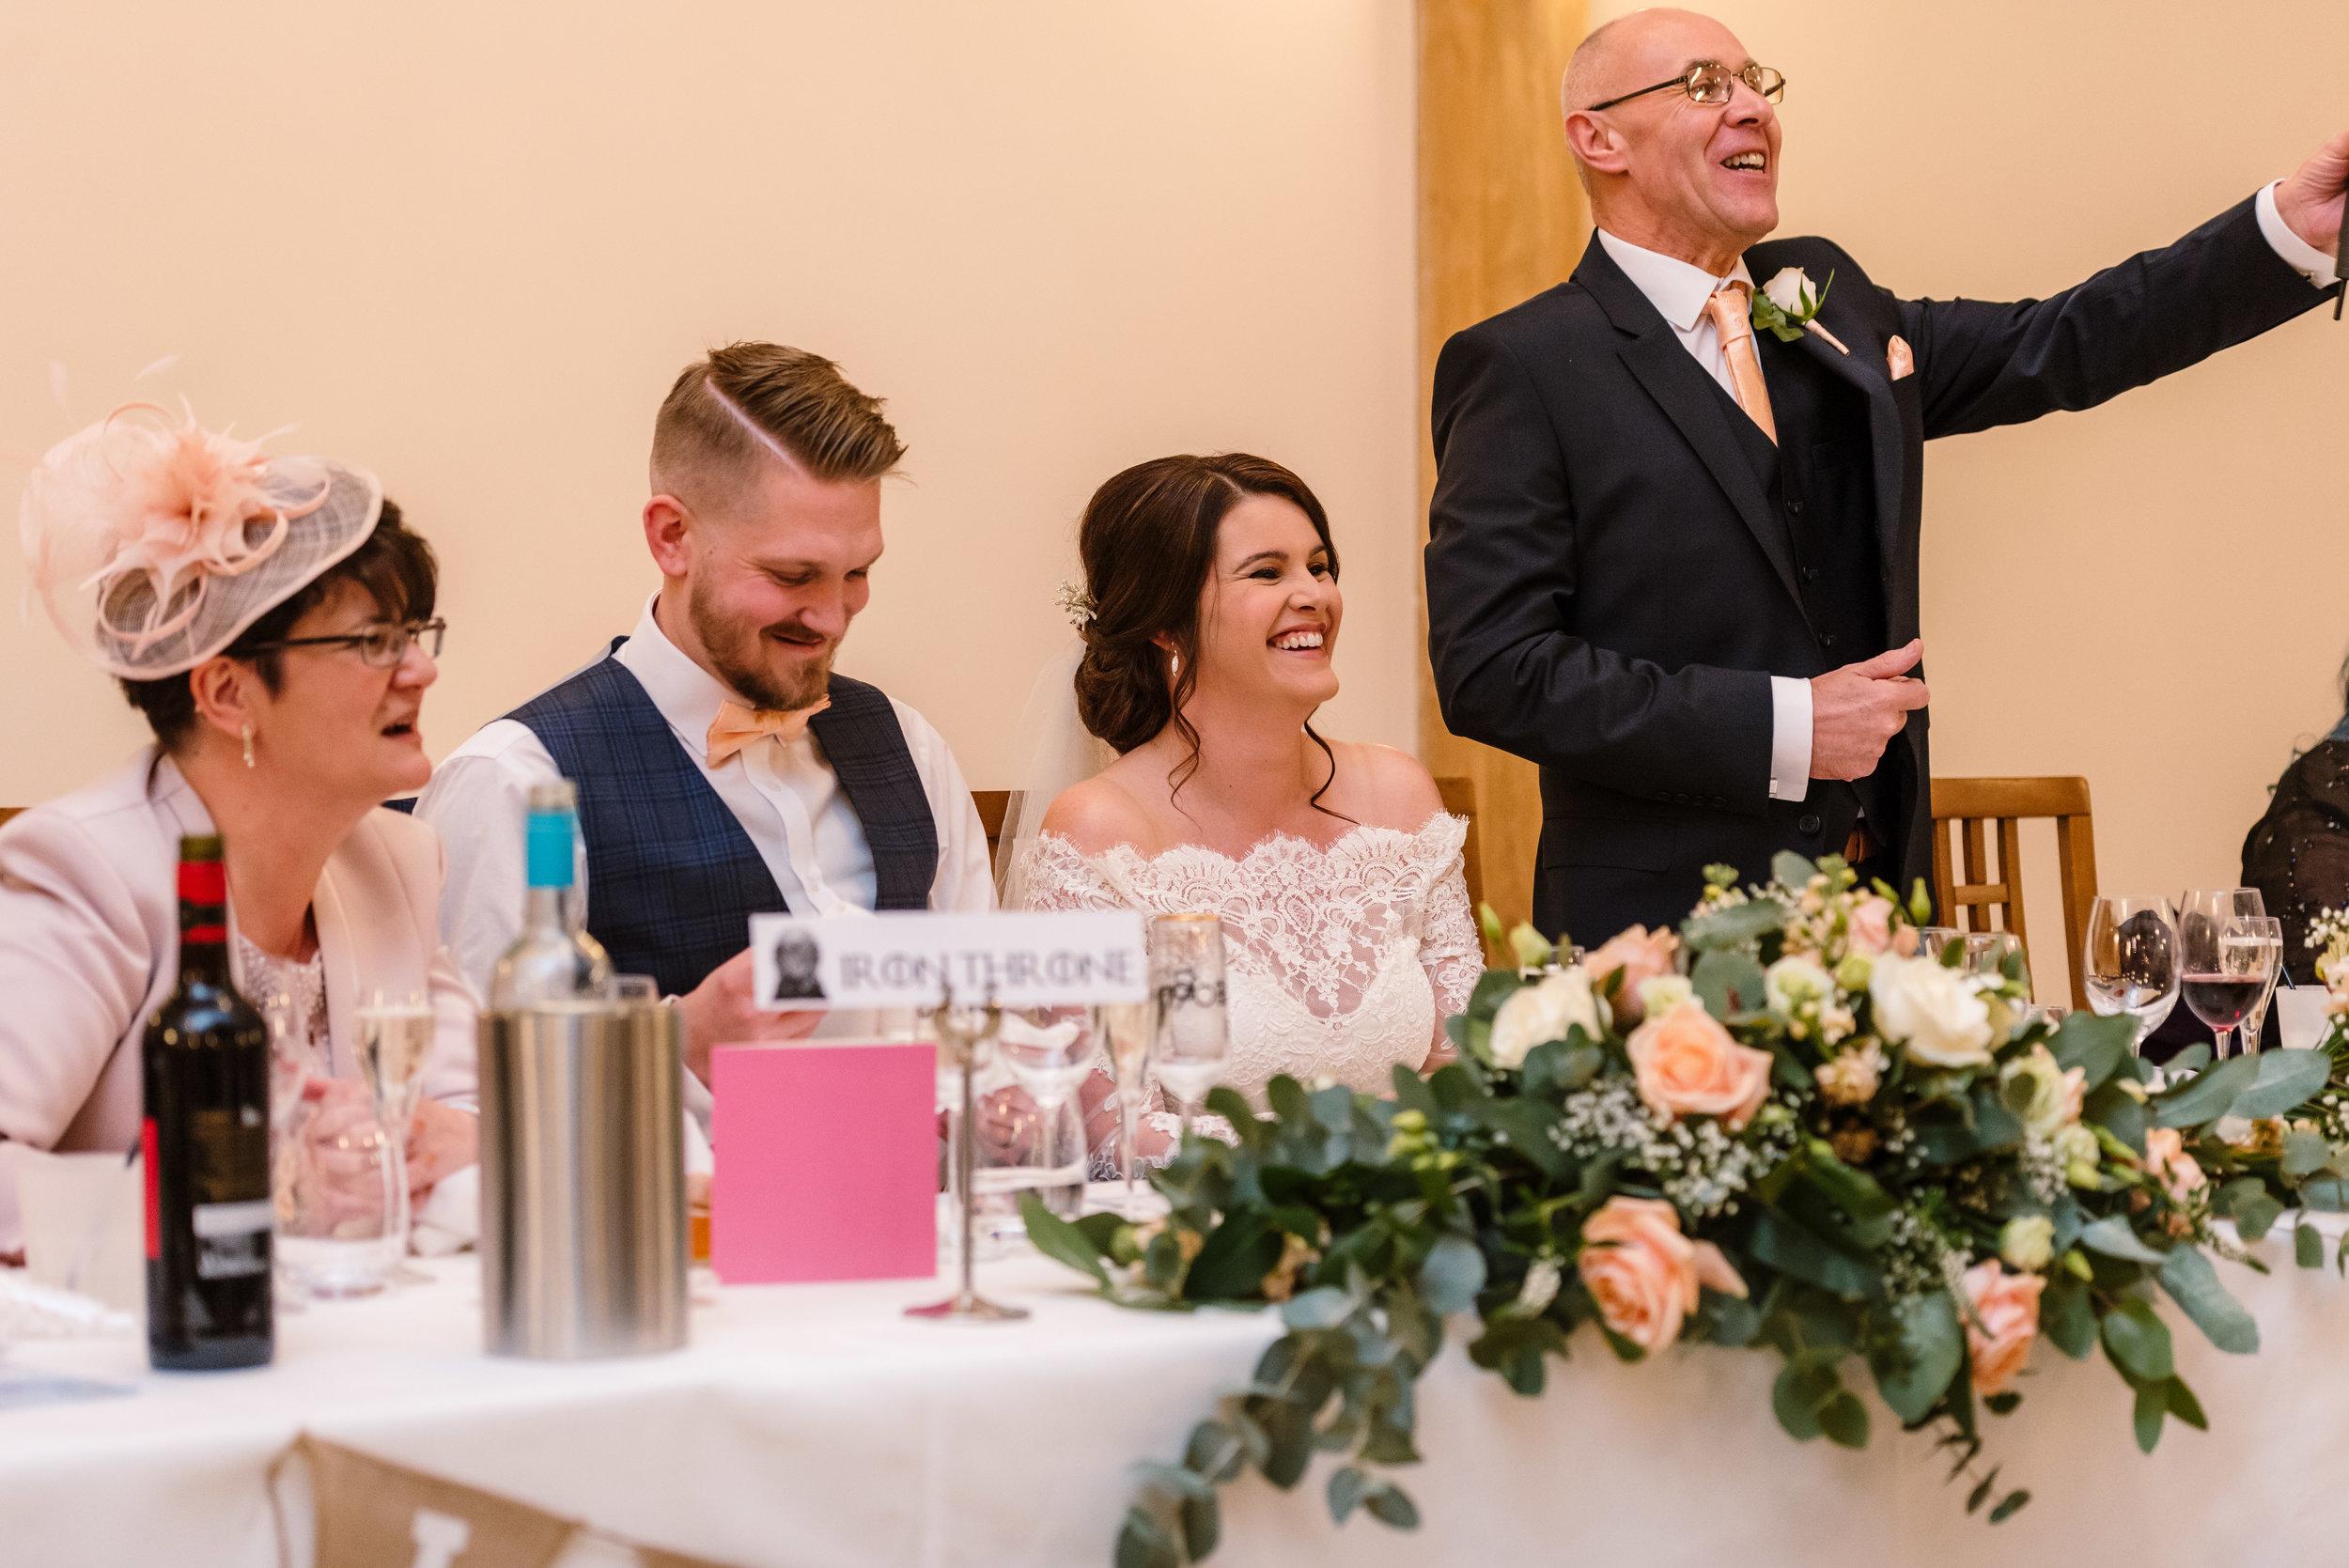 Sarah-Fishlock-Hampshire-wedding-photographer-hampshire / fleet-wedding-photographer-fleet / rivervale-barn-wedding / hampshire-barn-wedding-venue / hampshire-wedding-venue / wedding-in-snow